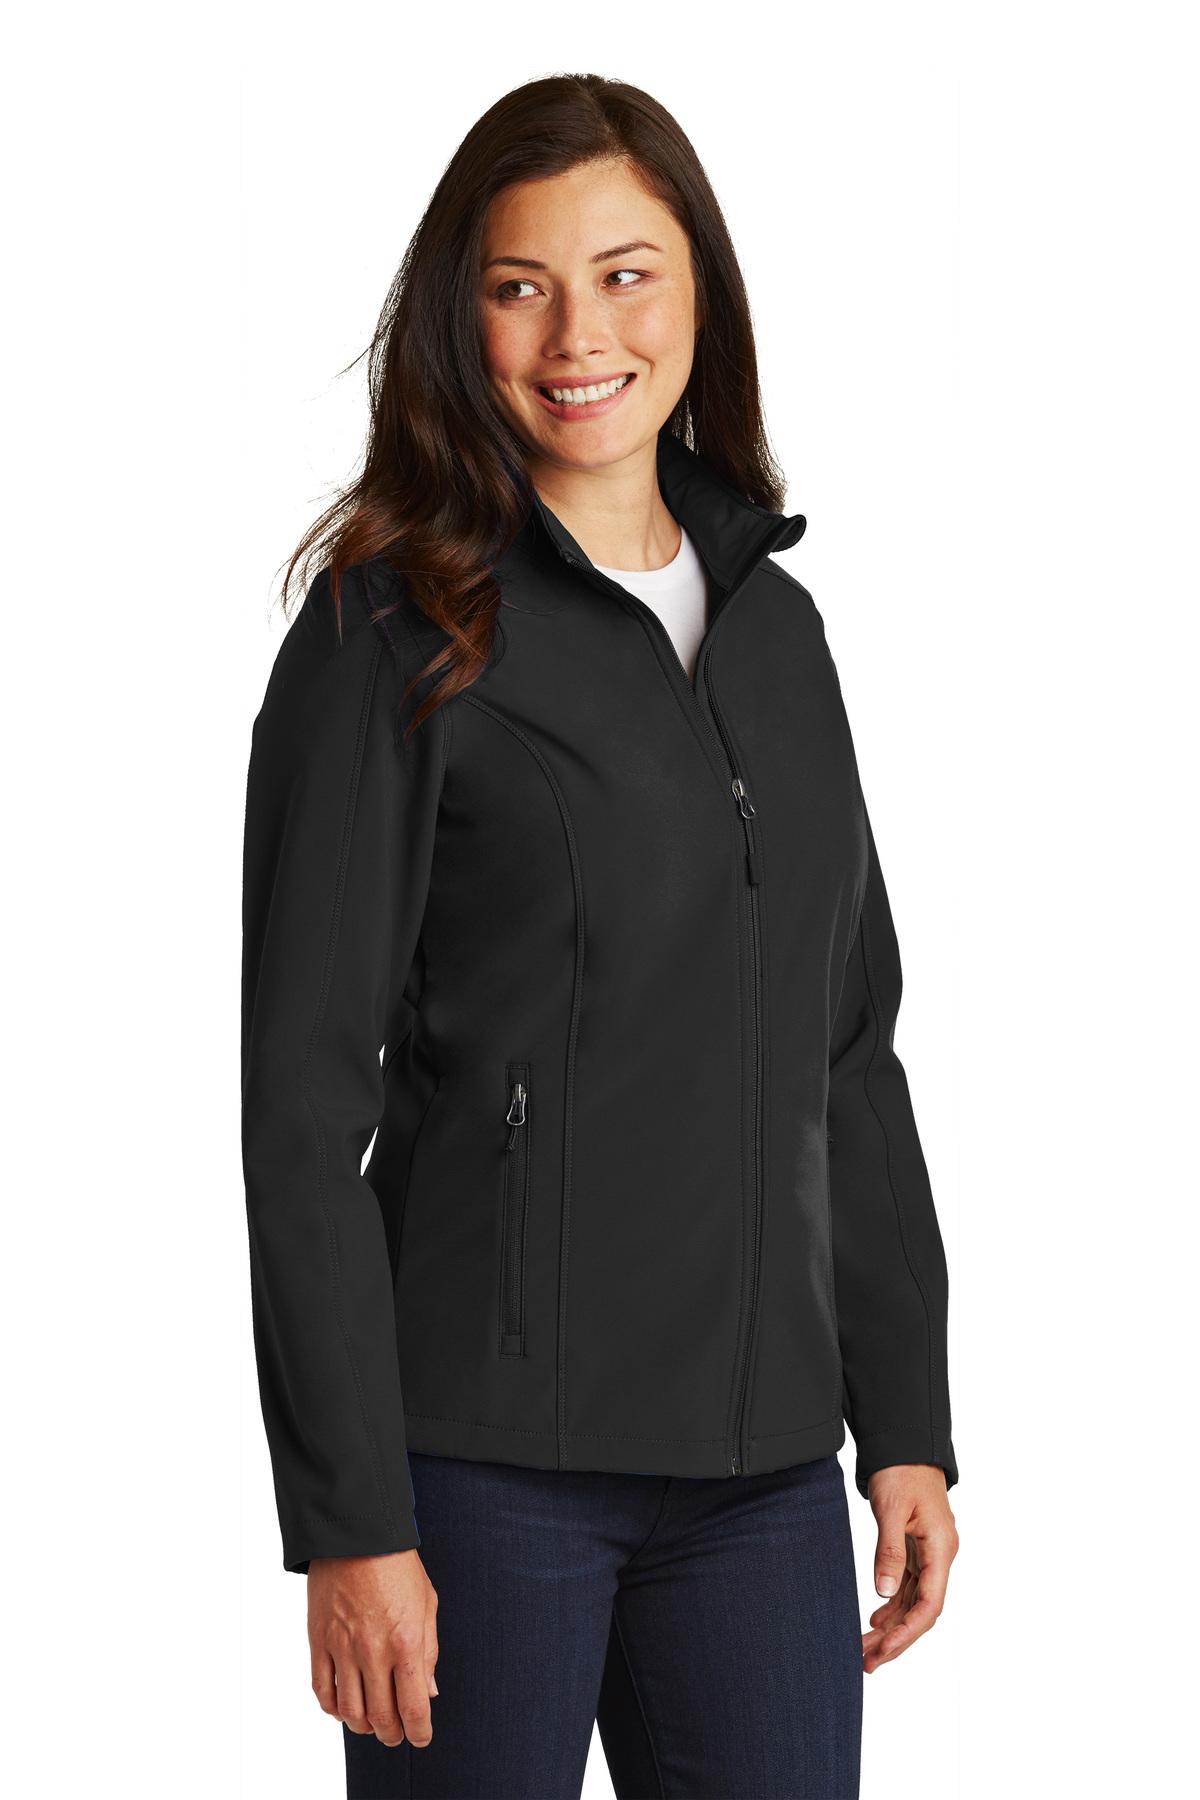 6fff2a3555d Port Authority® Ladies Core Soft Shell Jacket